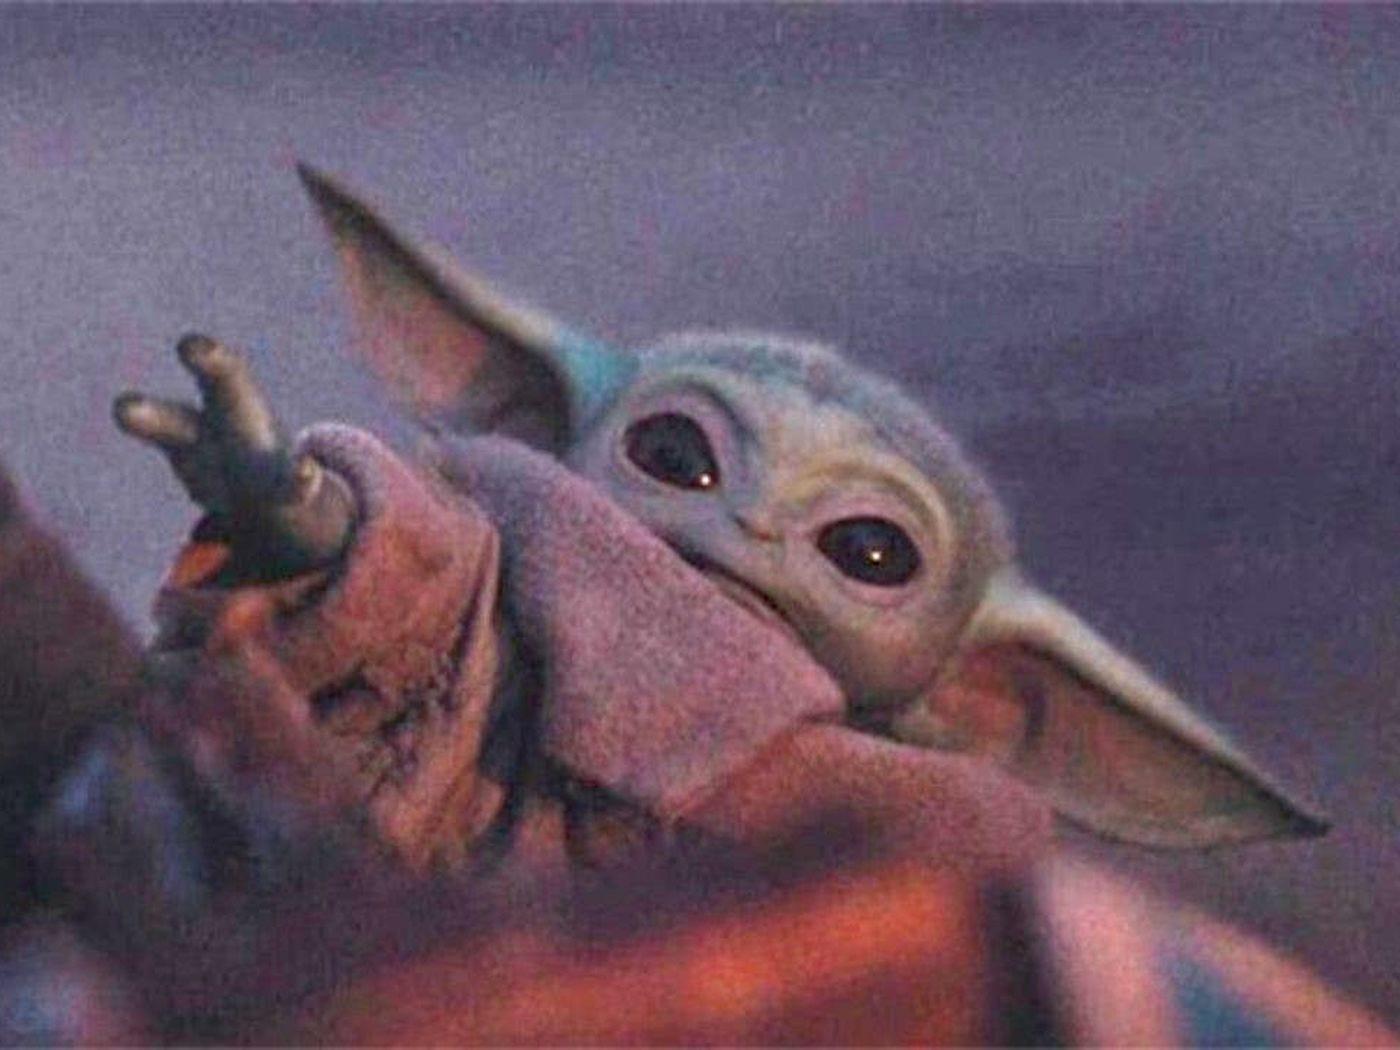 Disney boss Bob Iger knows Baby Yoda's real name, isn't telling - Polygon